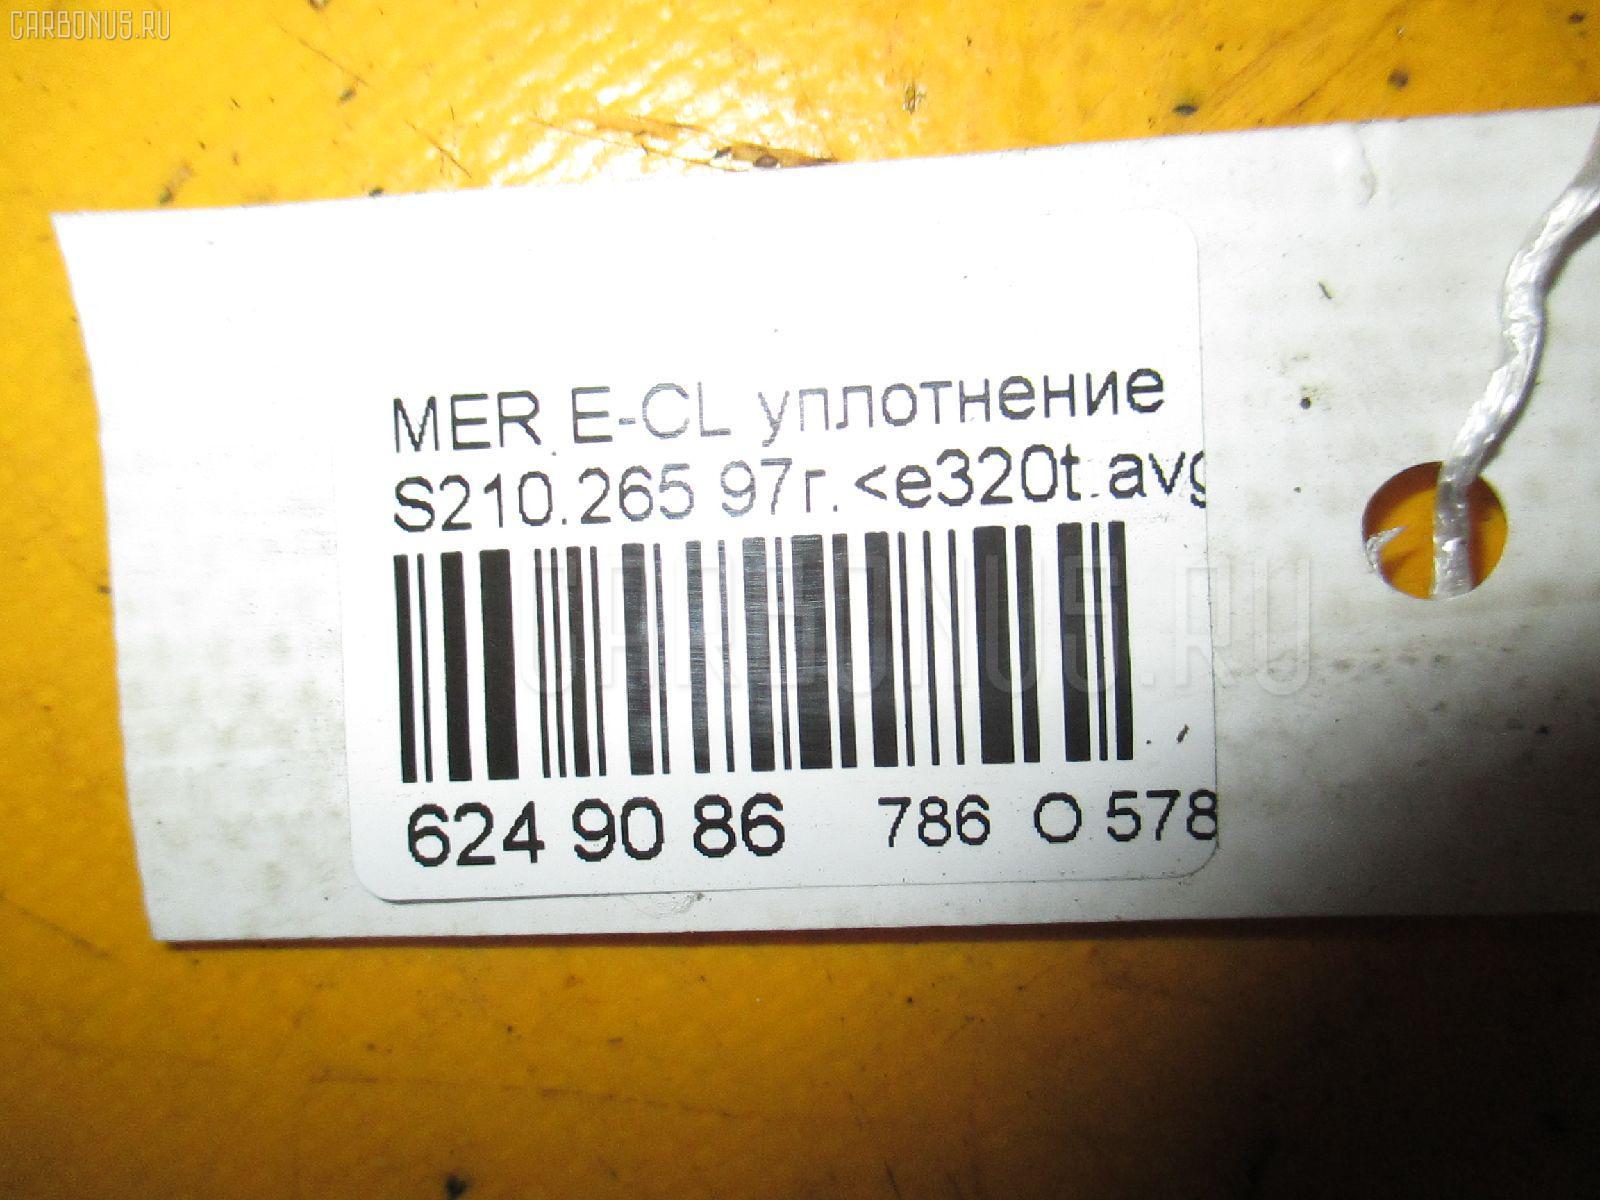 Уплотнение MERCEDES-BENZ E-CLASS STATION WAGON S210.265 Фото 7